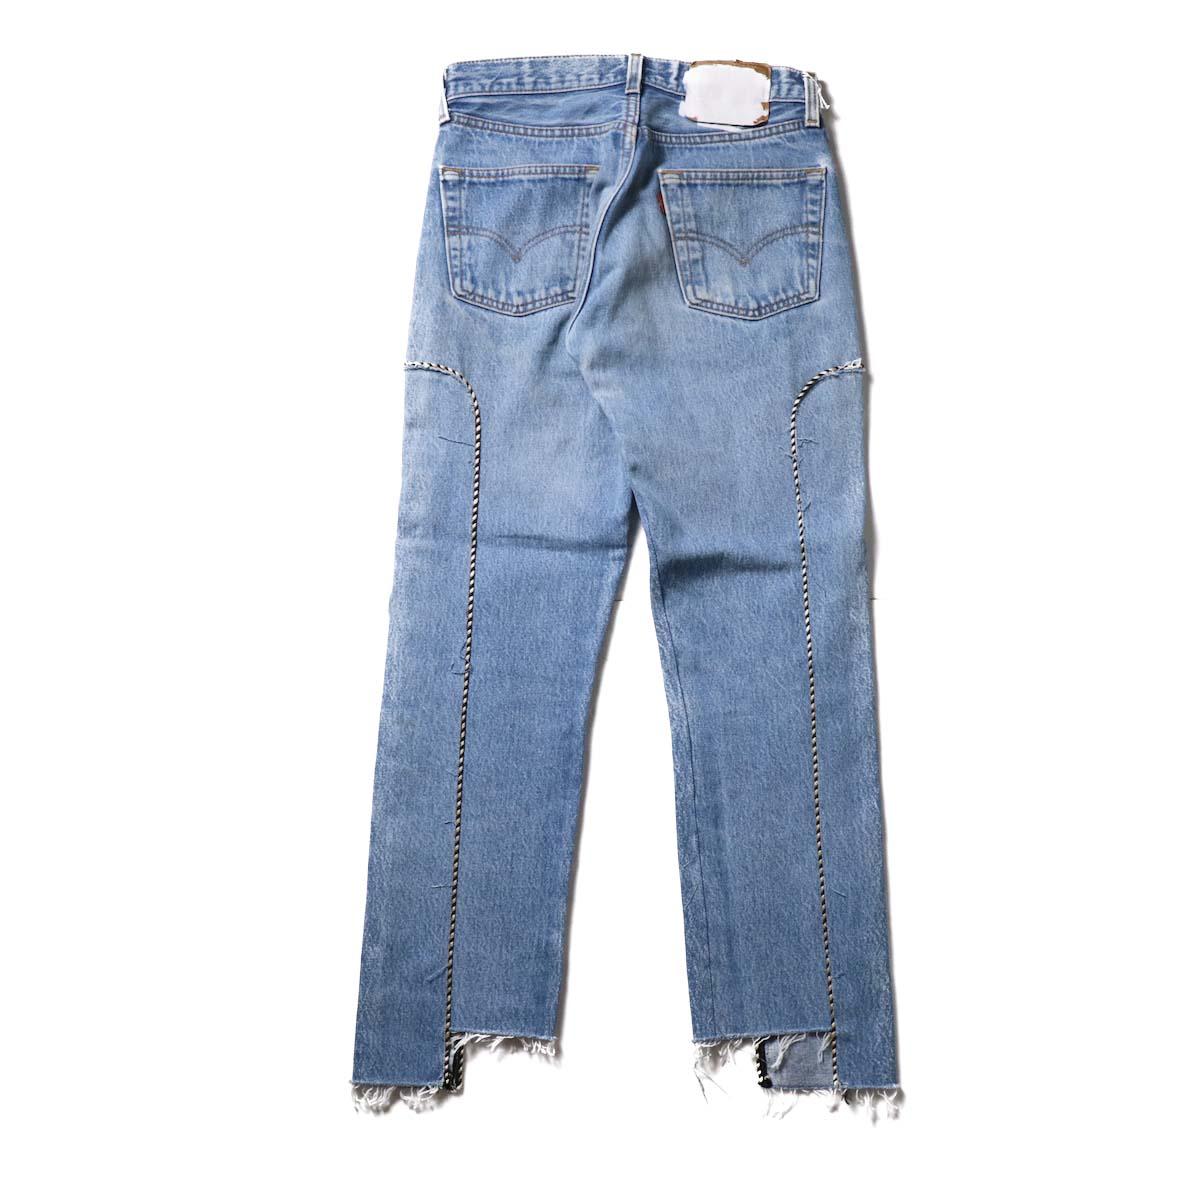 OLD PARK / Western Jeans Blue (Ssize-B)背面